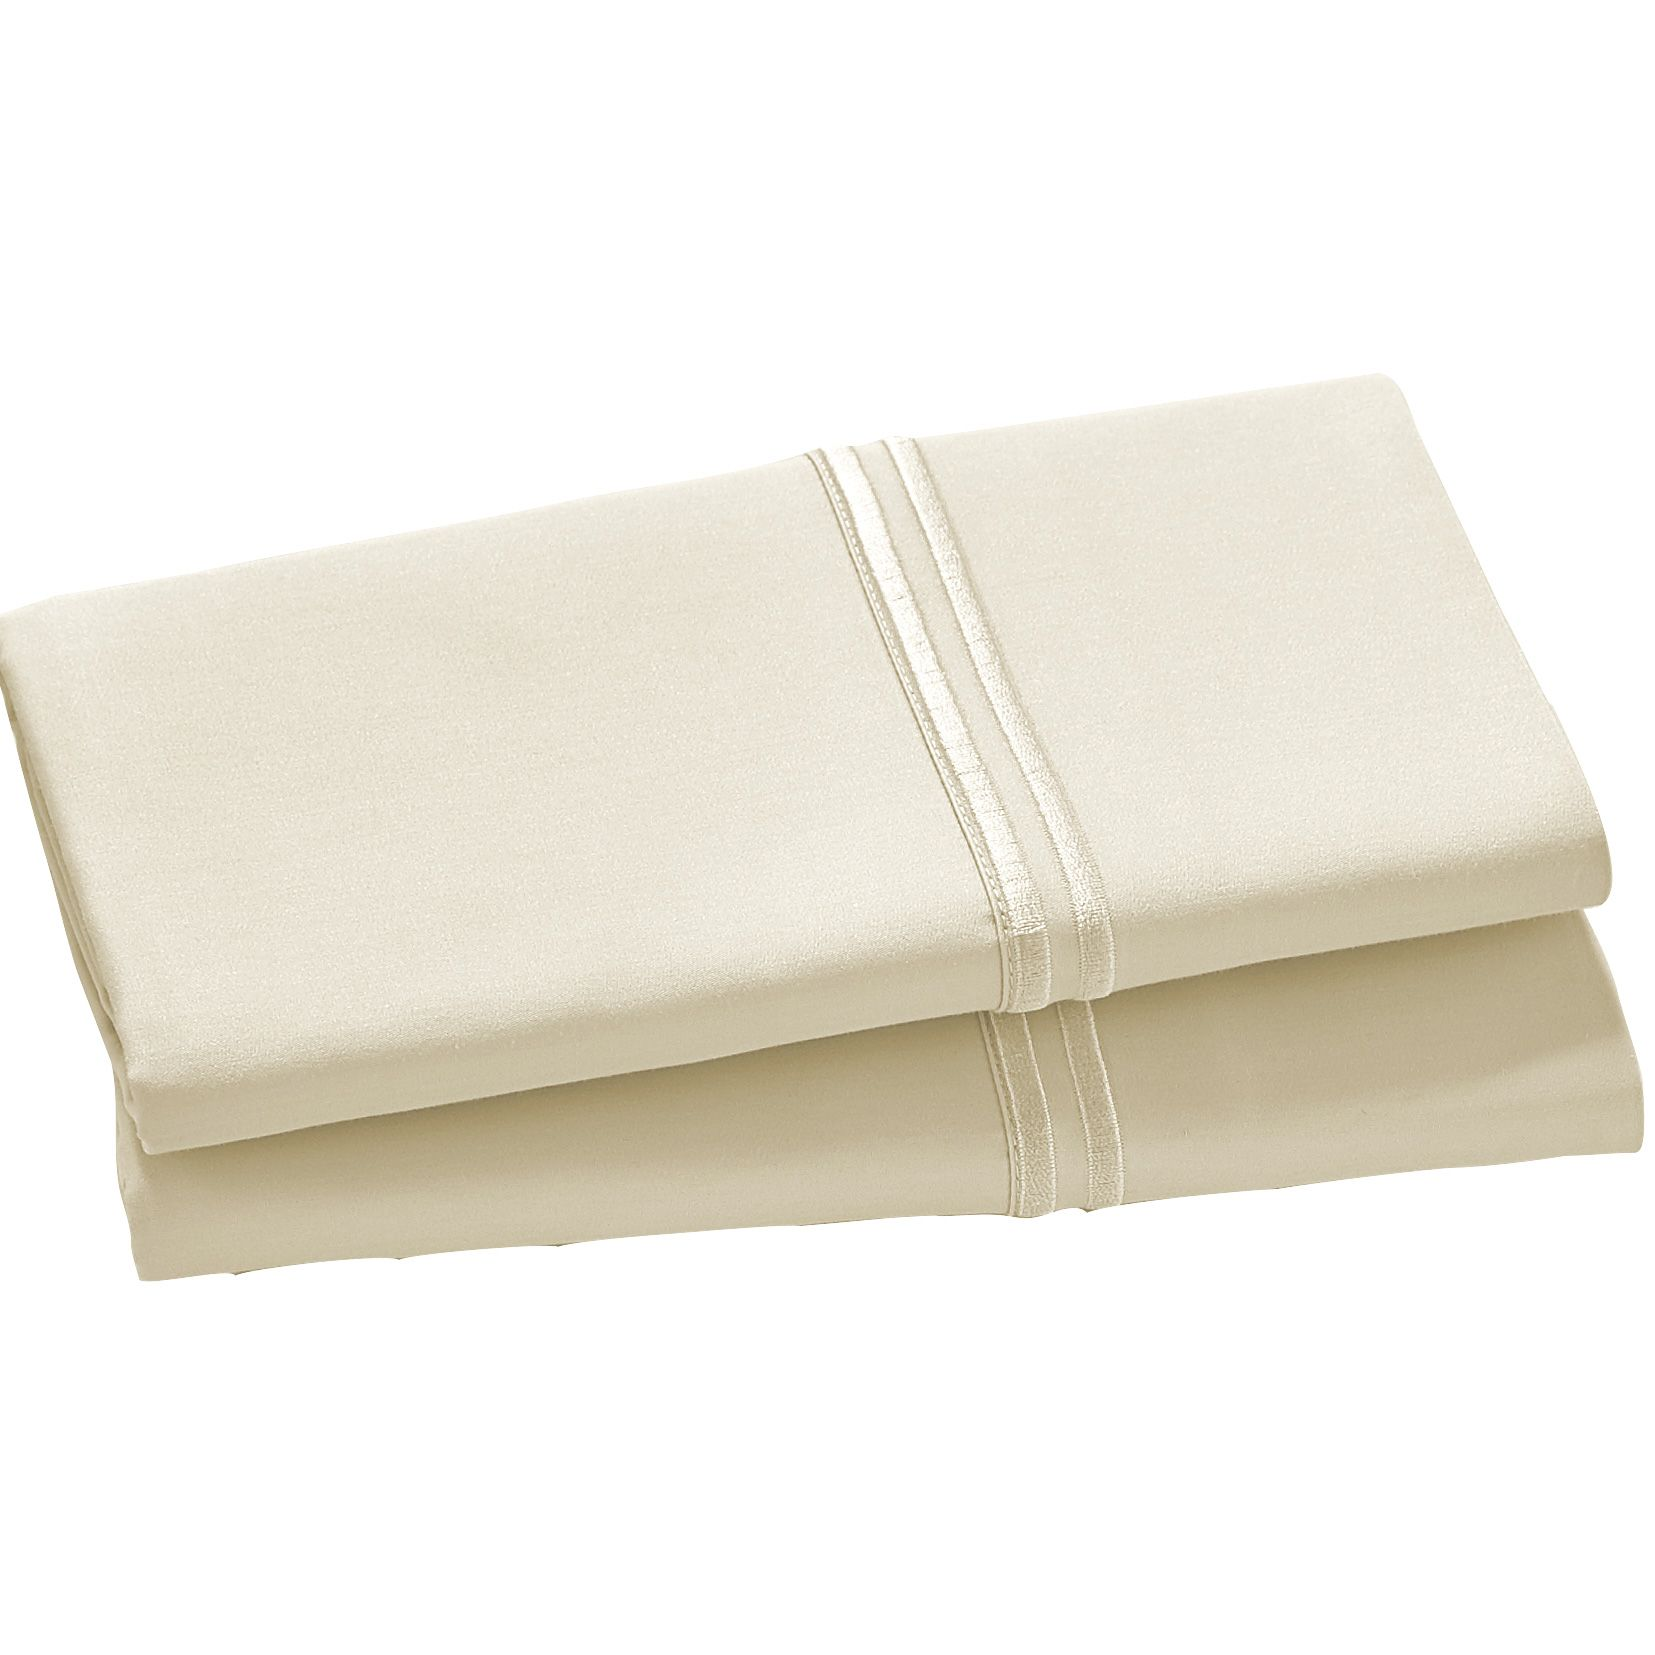 Purecare | Elements Ivory Queen Modal Pillowcase